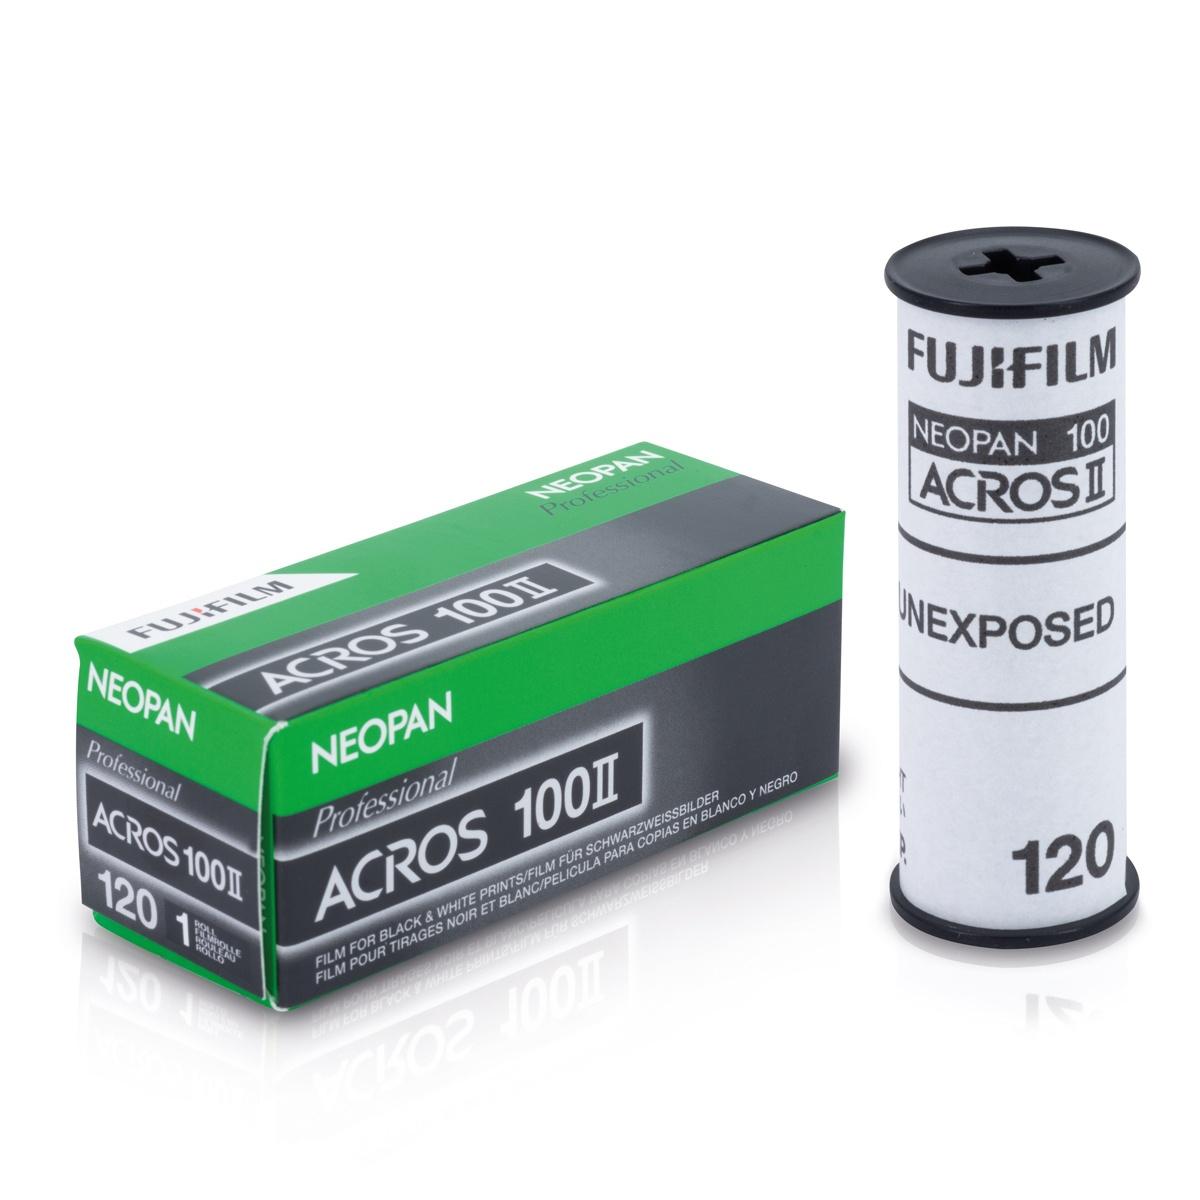 Fujifilm Neopan Acros 100 120 Rollfilm SW